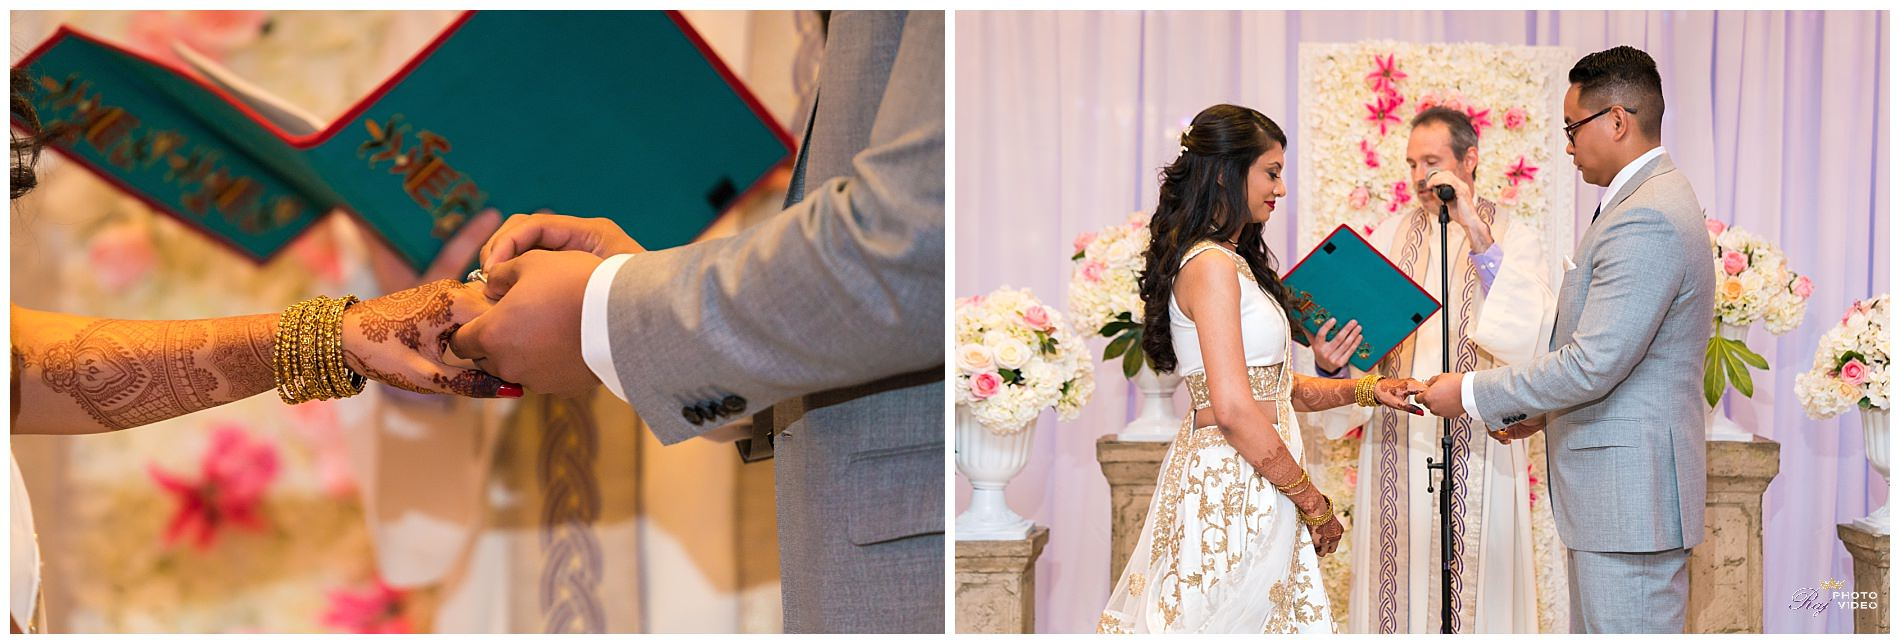 Royal-Manor-Garfield-NJ-Christian-Wedding-Ceremony-Khusbu-Jeff-50.jpg